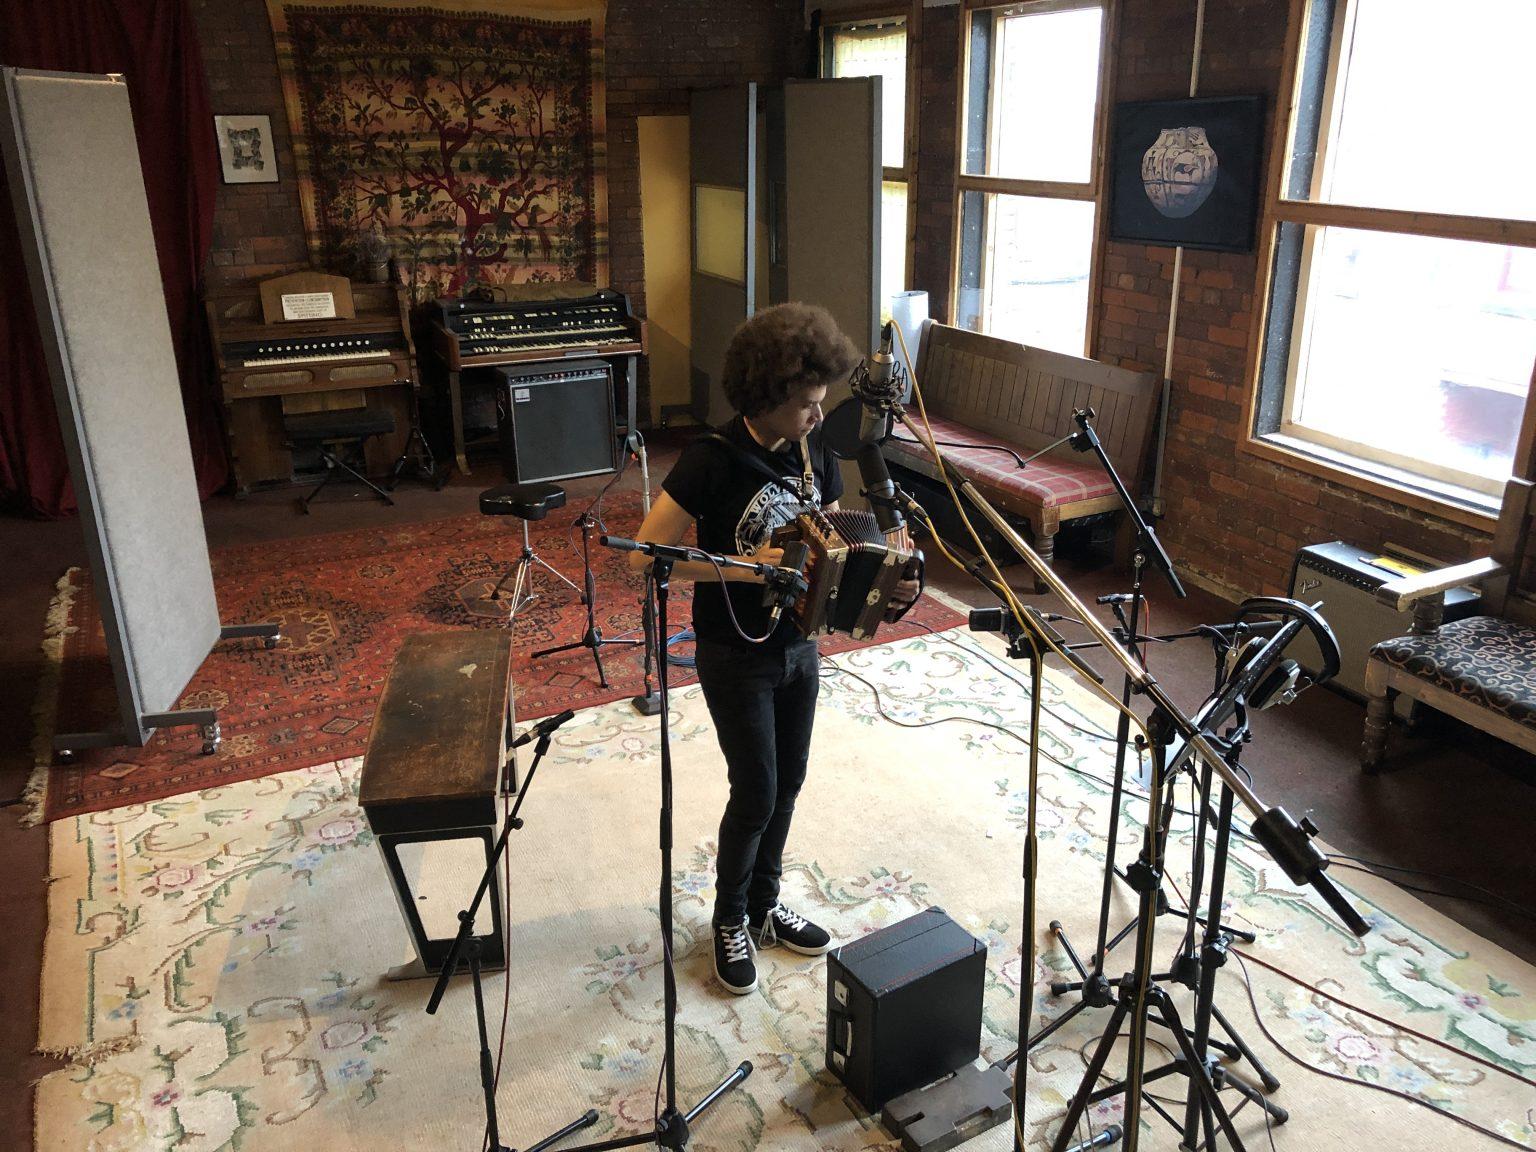 Cohen Braithwaite-Kilcoyne discusses his album, Rakes & Misfits, with Jon Wilks